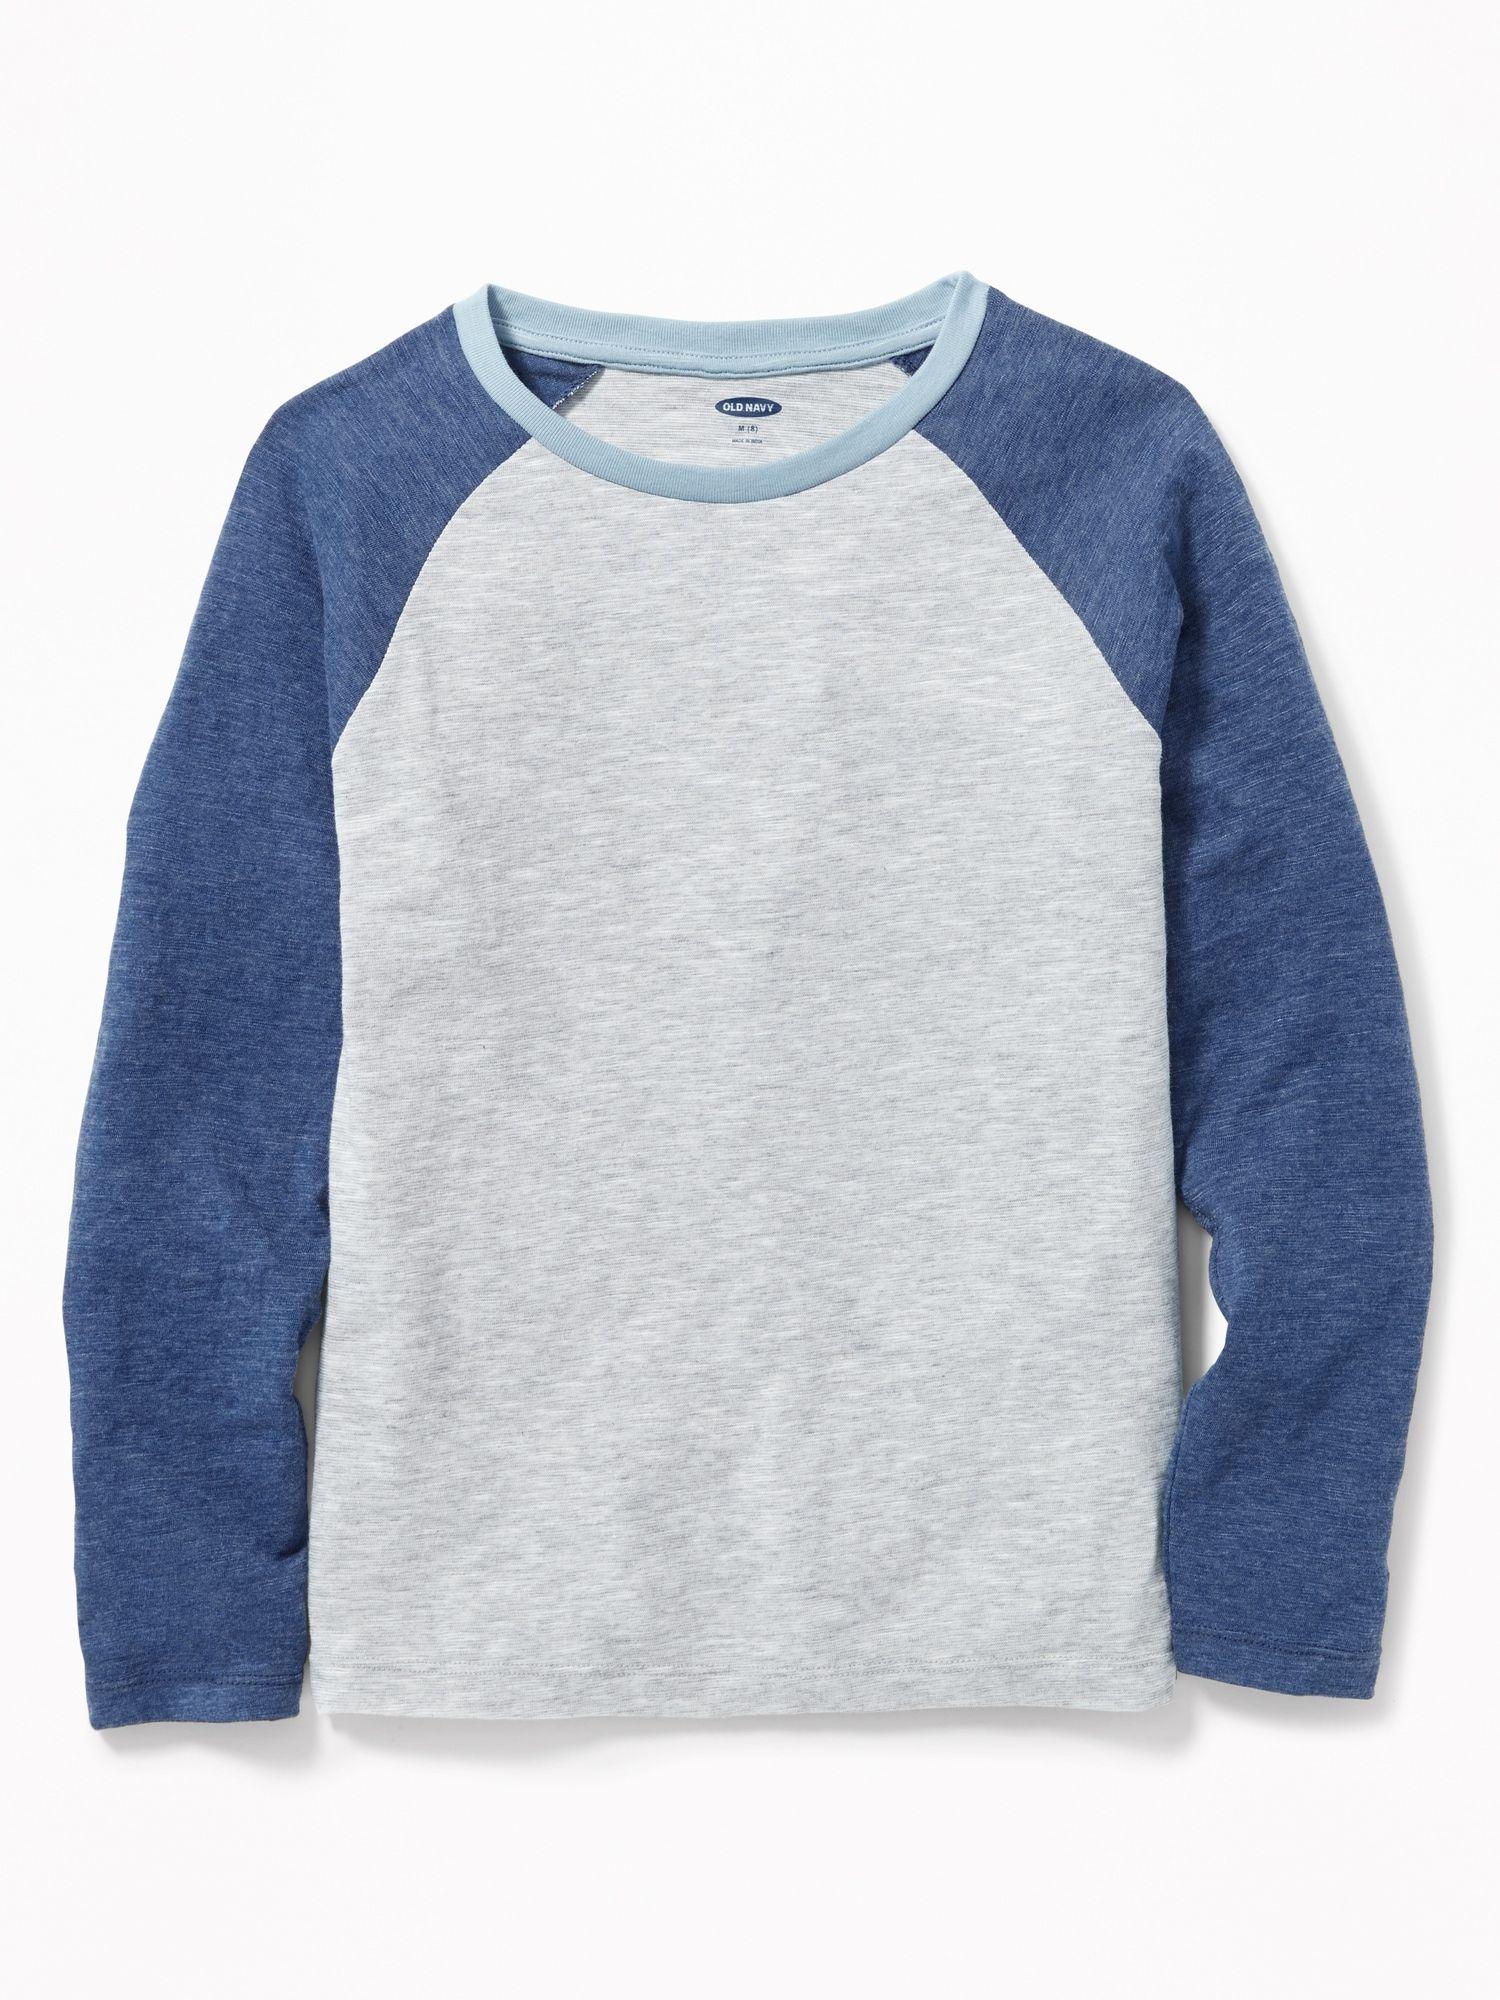 Toddler Kid Boy Girl Raglan Baseball Tee Shirt Tops Soft Casual T-Shirt